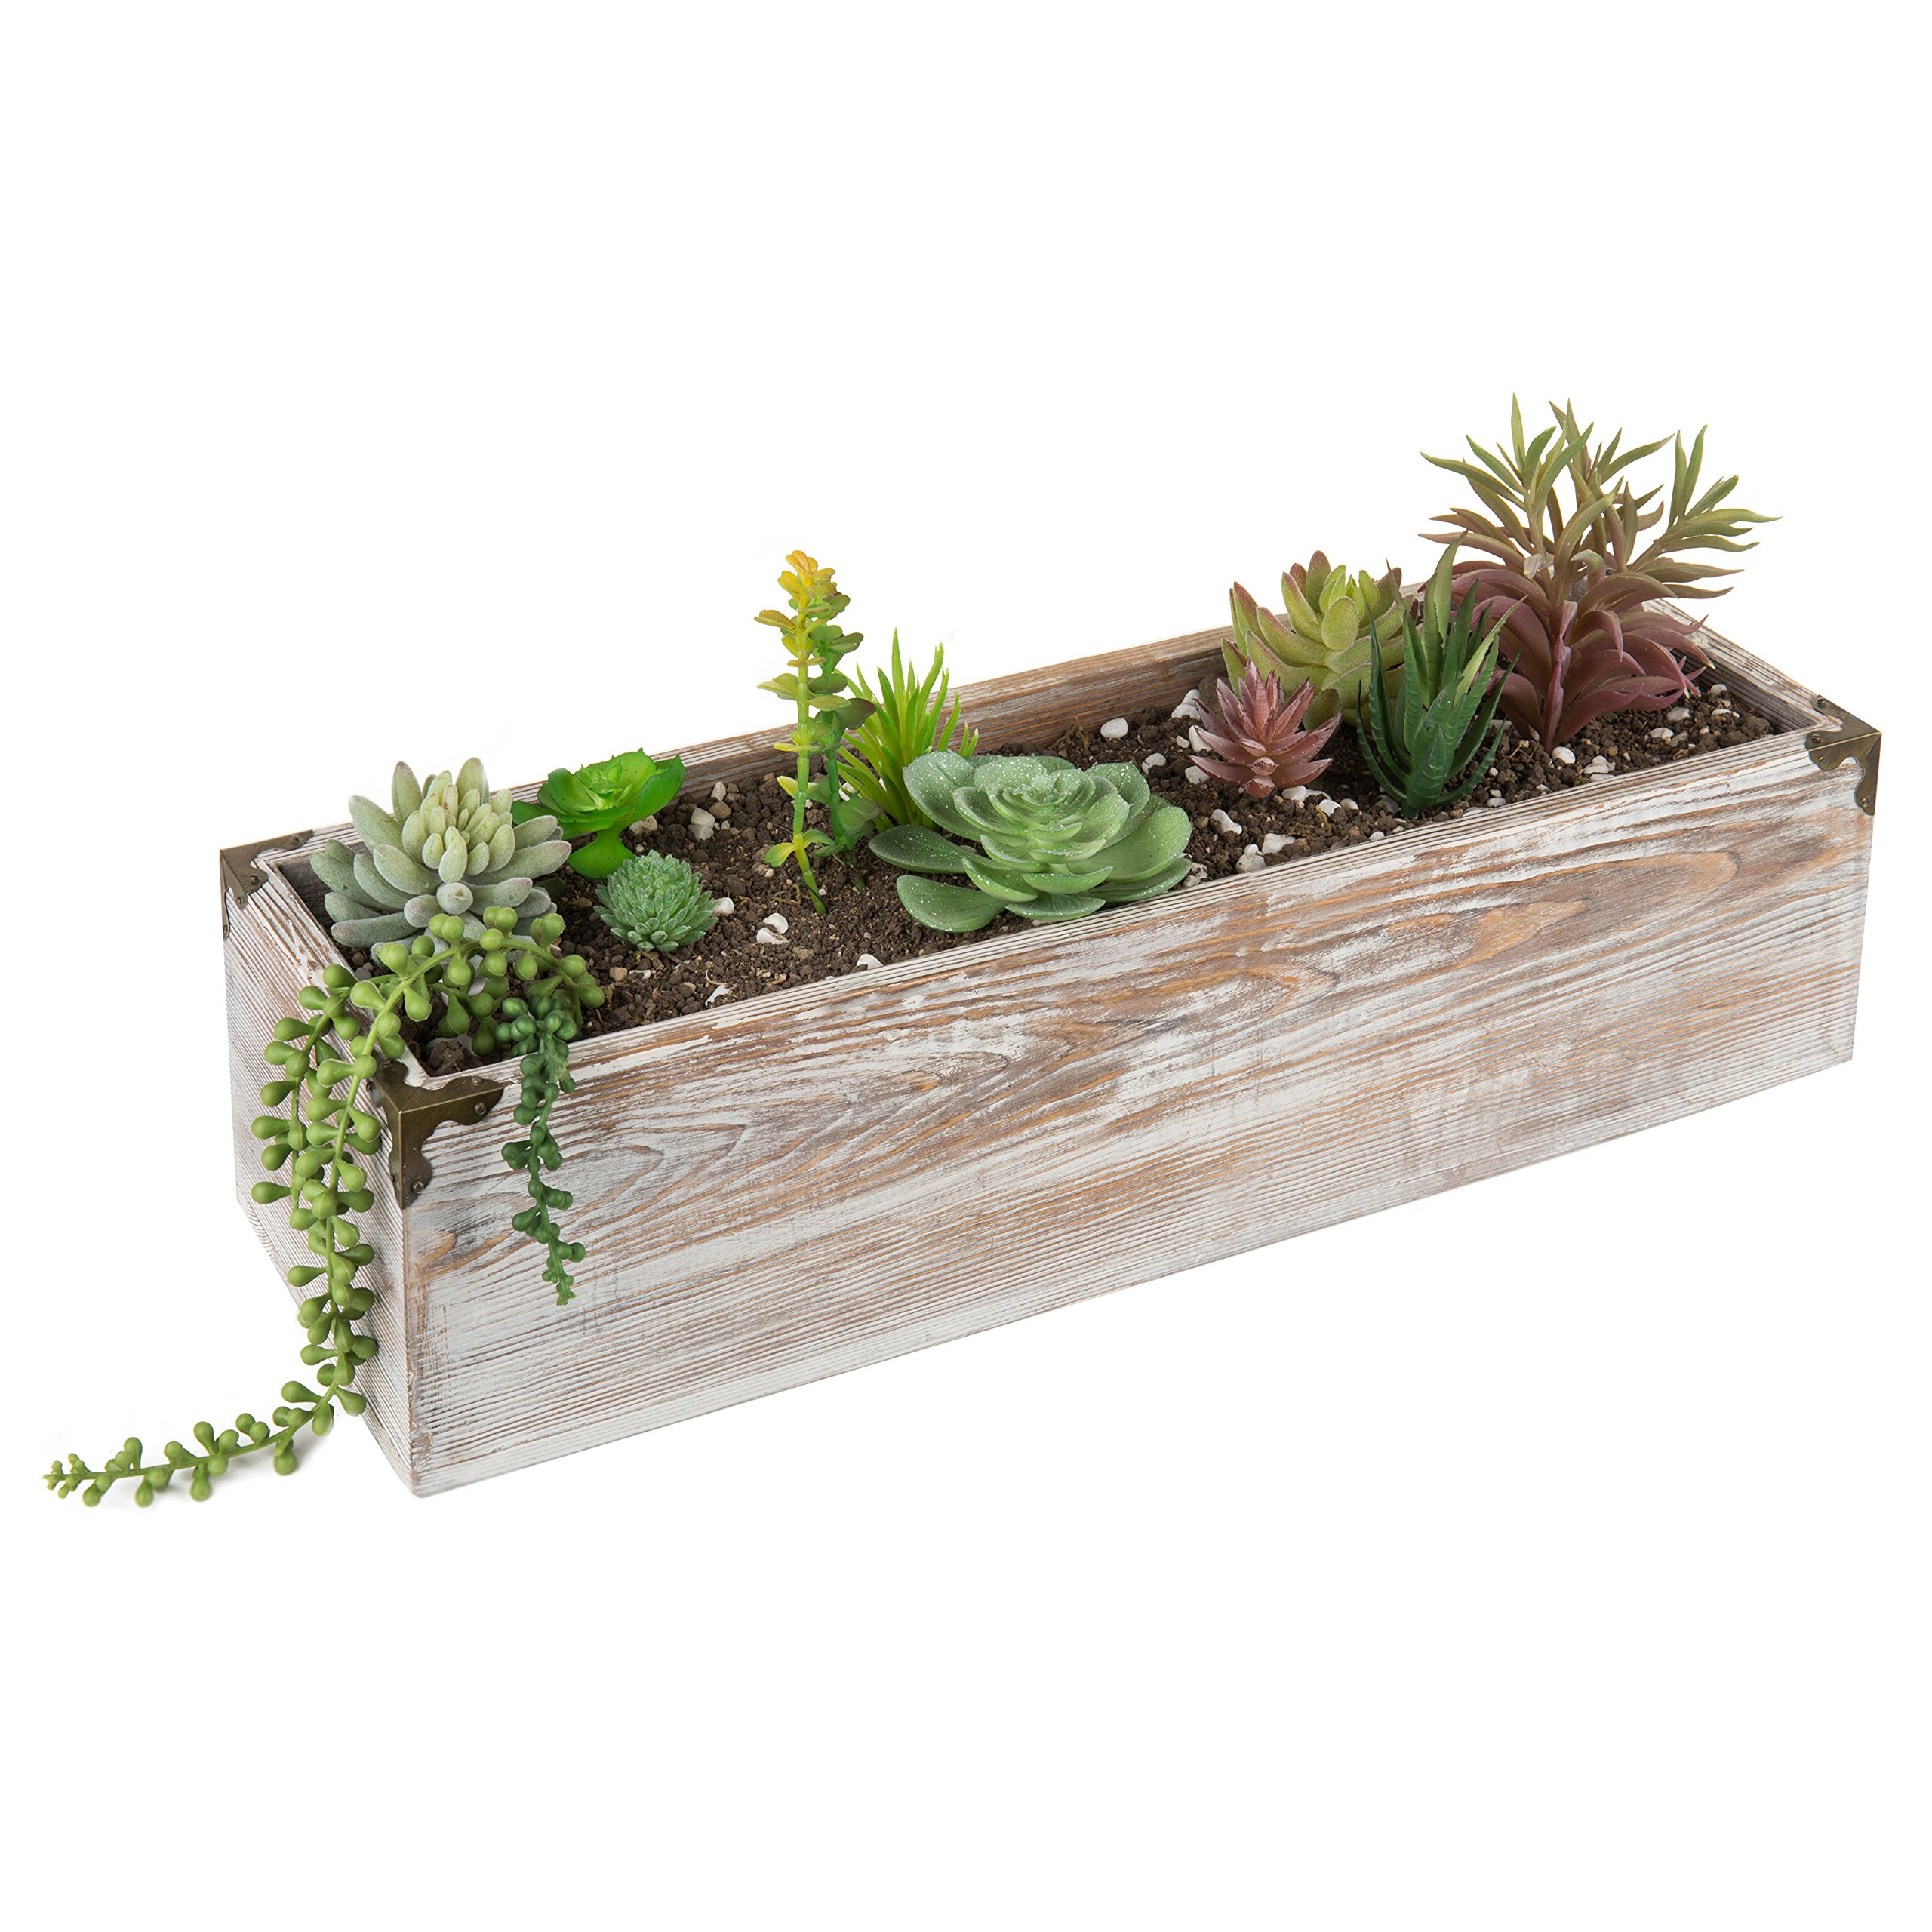 MyGift 21-Inch Rustic Whitewashed Wood Planter Box